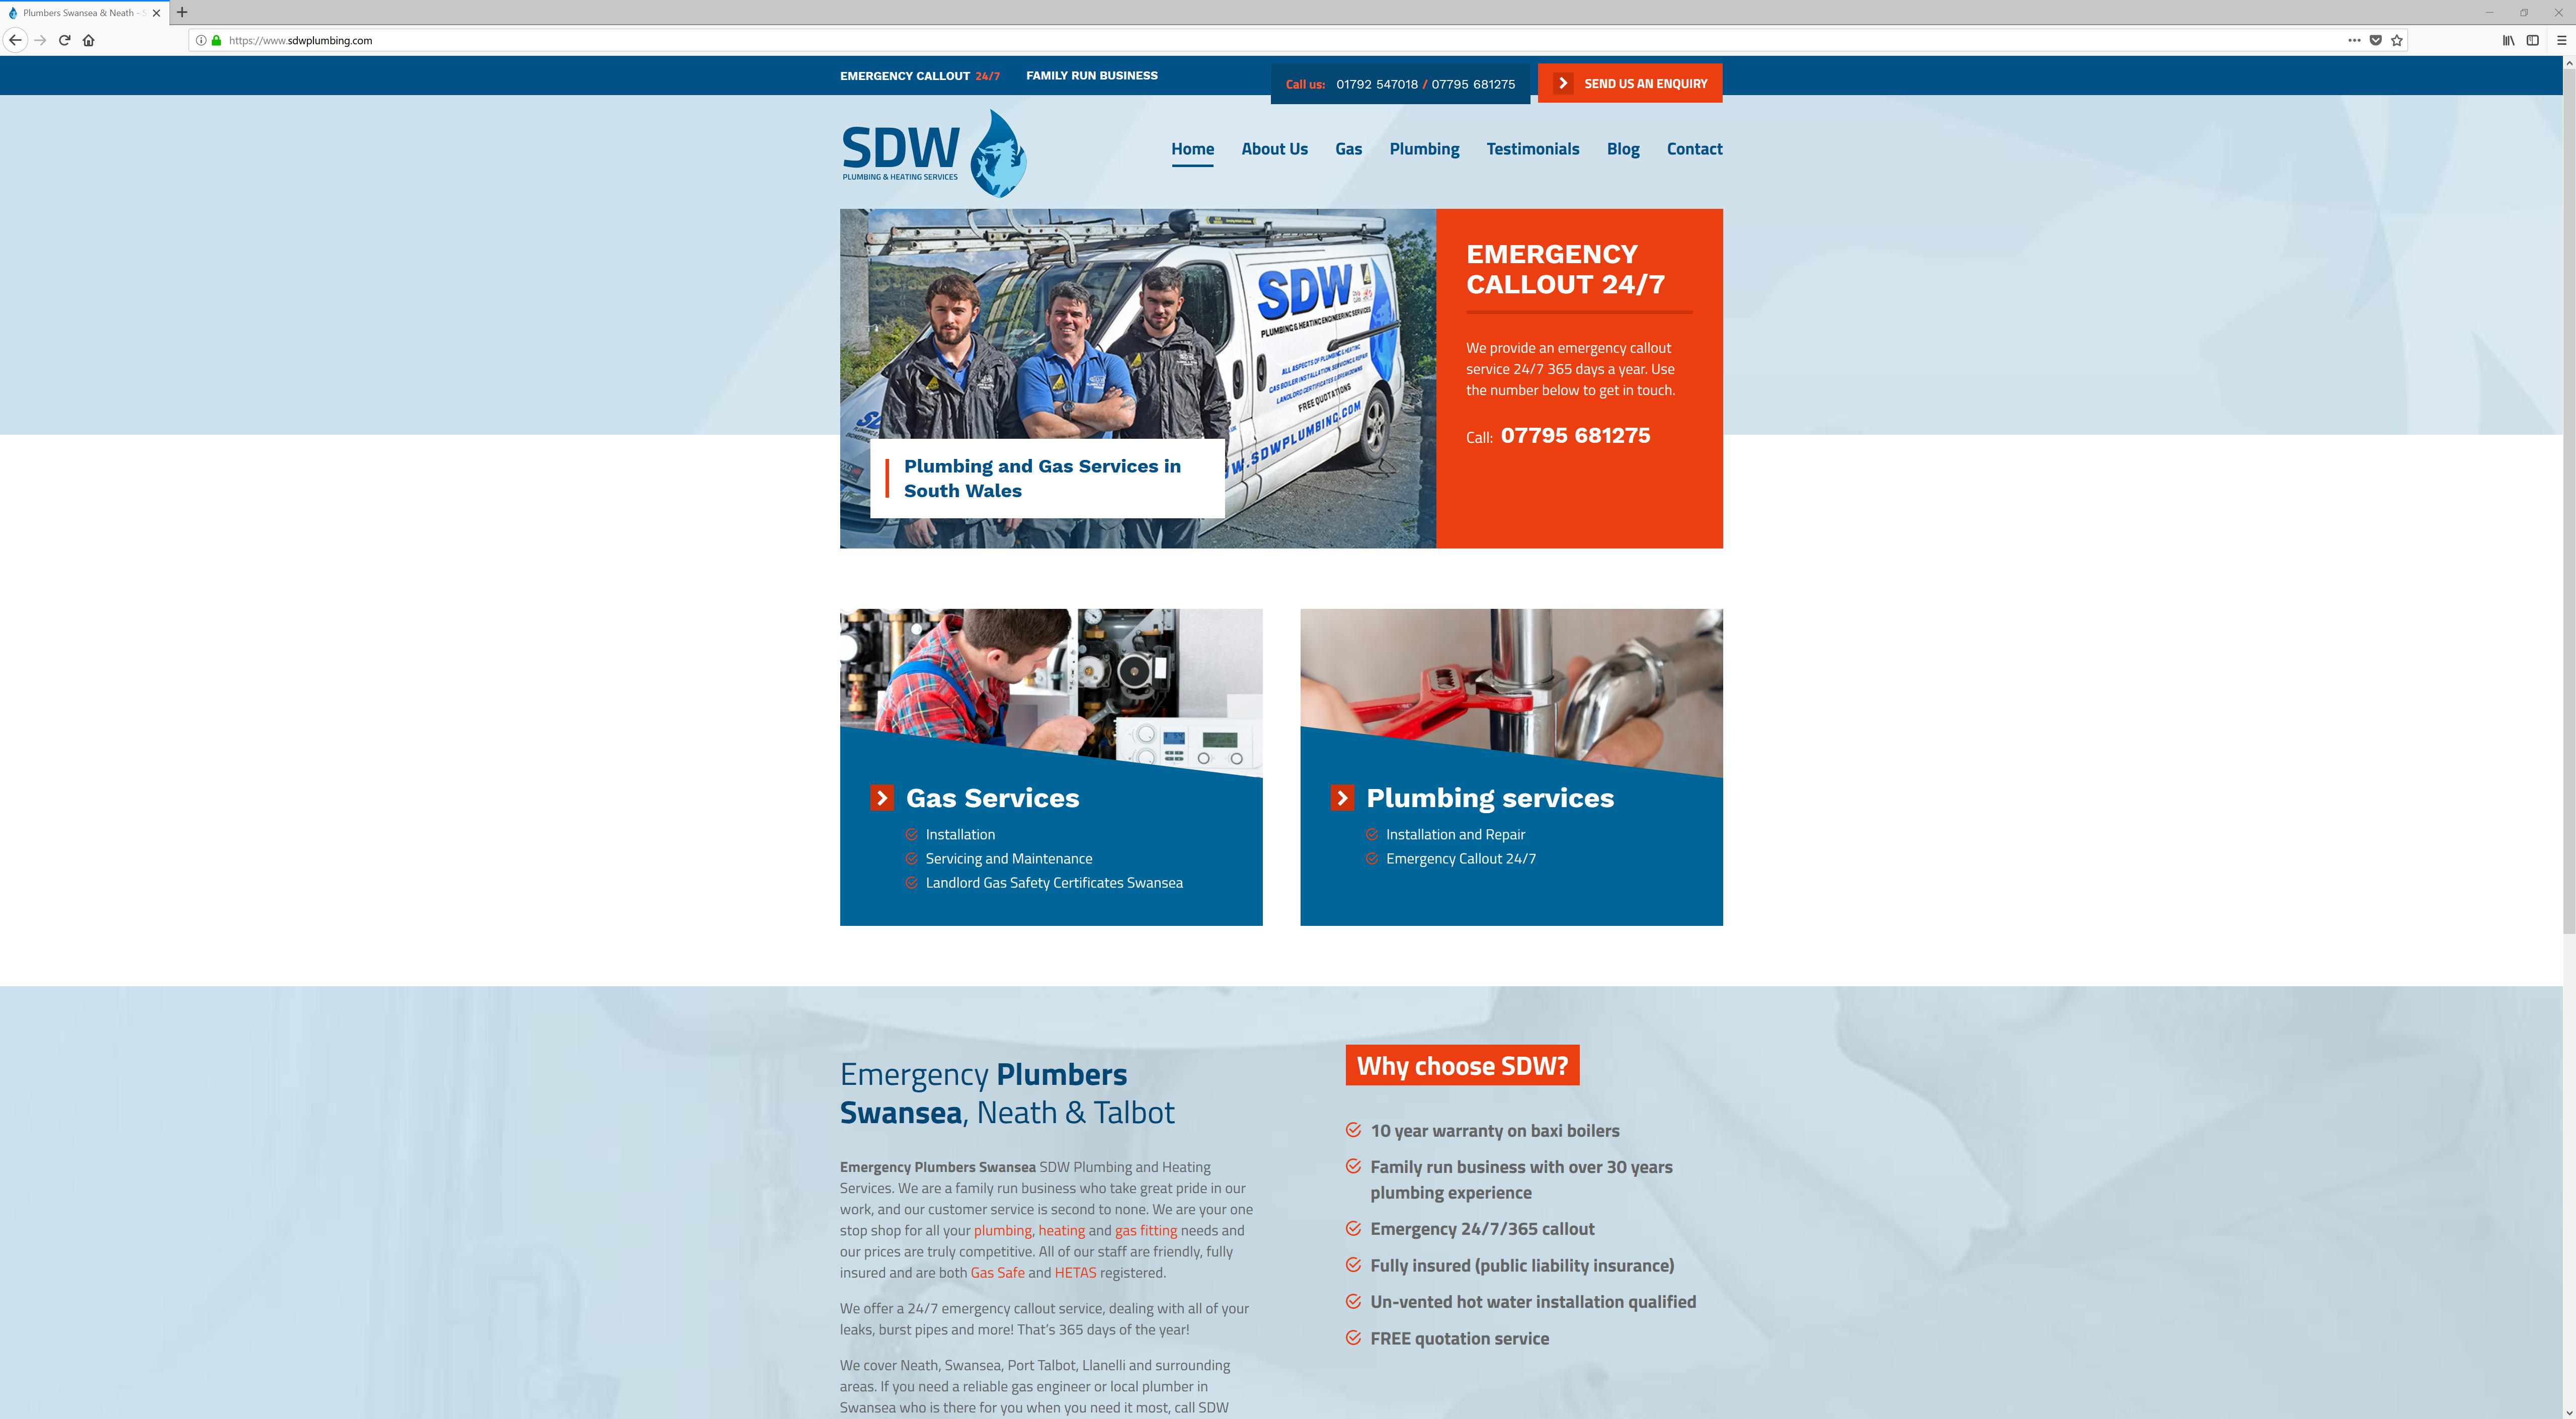 Plumbers Swansea & Neath - SDW Plumbing & Heating Services